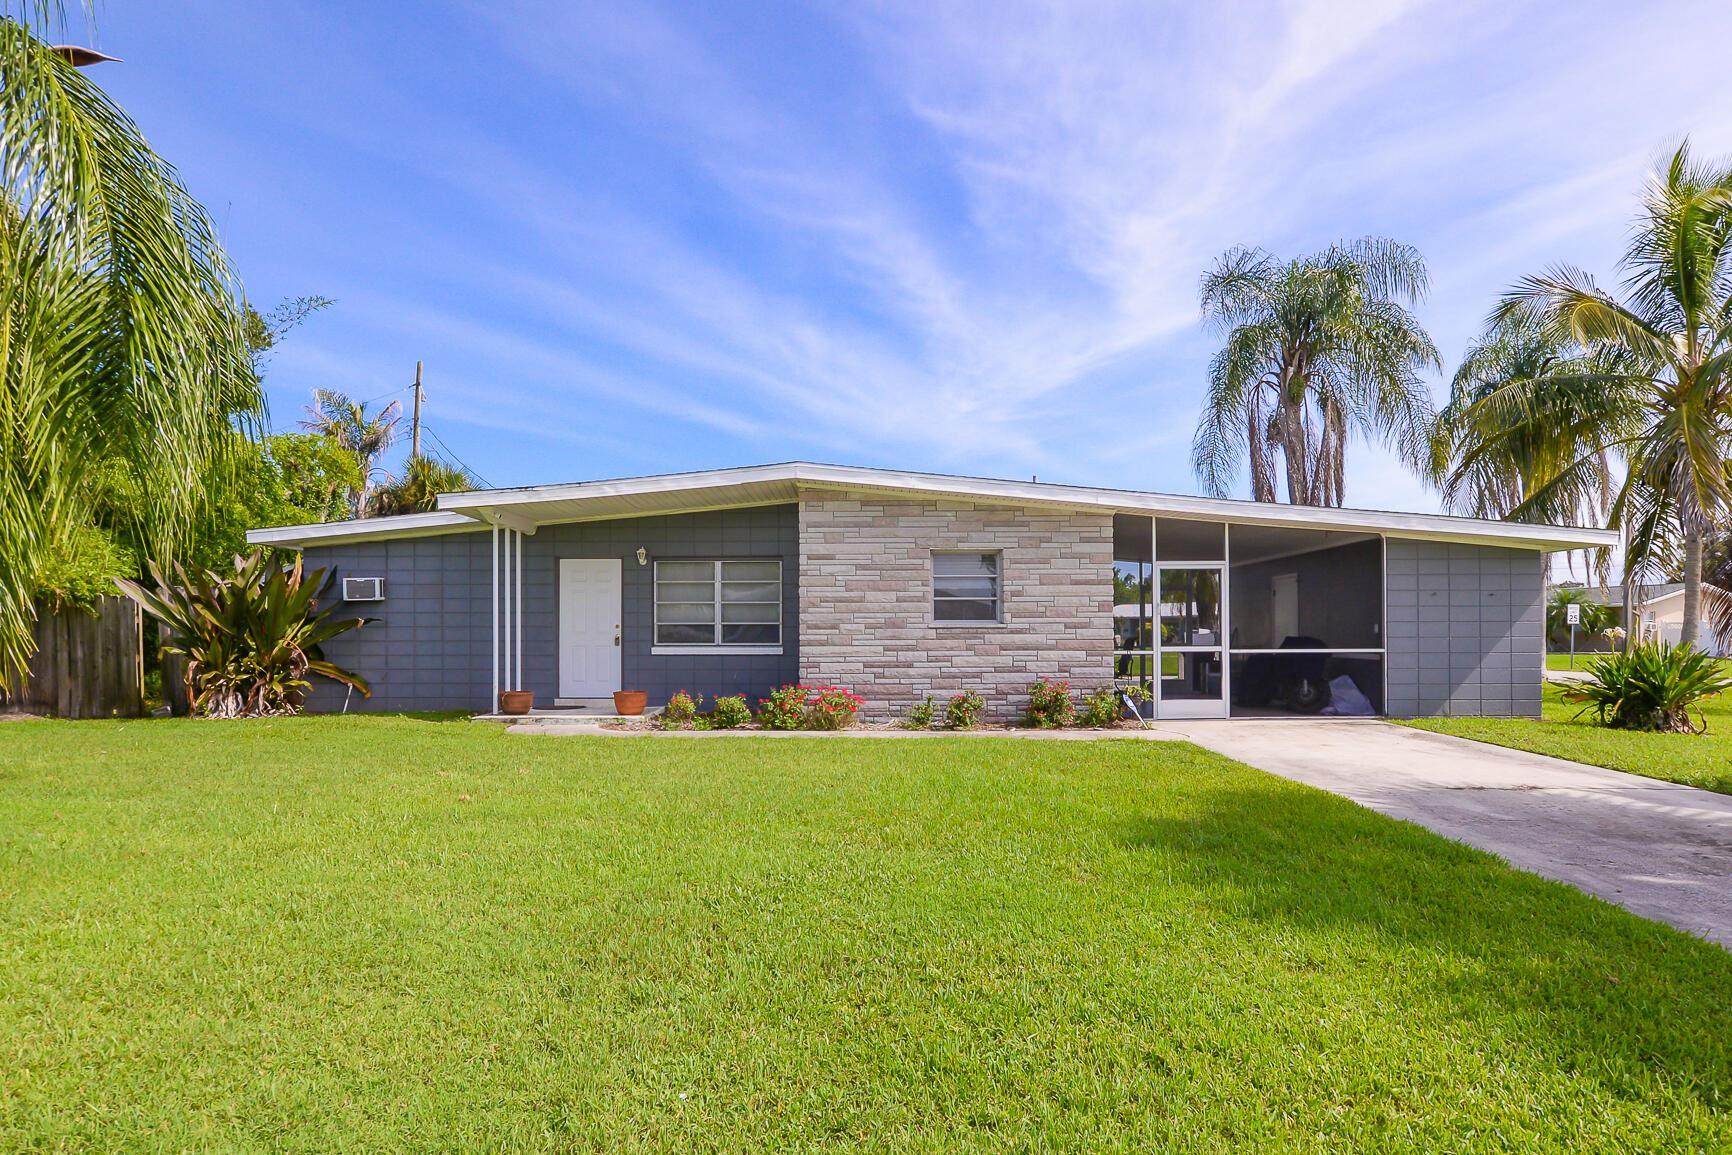 768 Lomas Street N, Port Saint Lucie, FL 34952 - #: RX-10742342